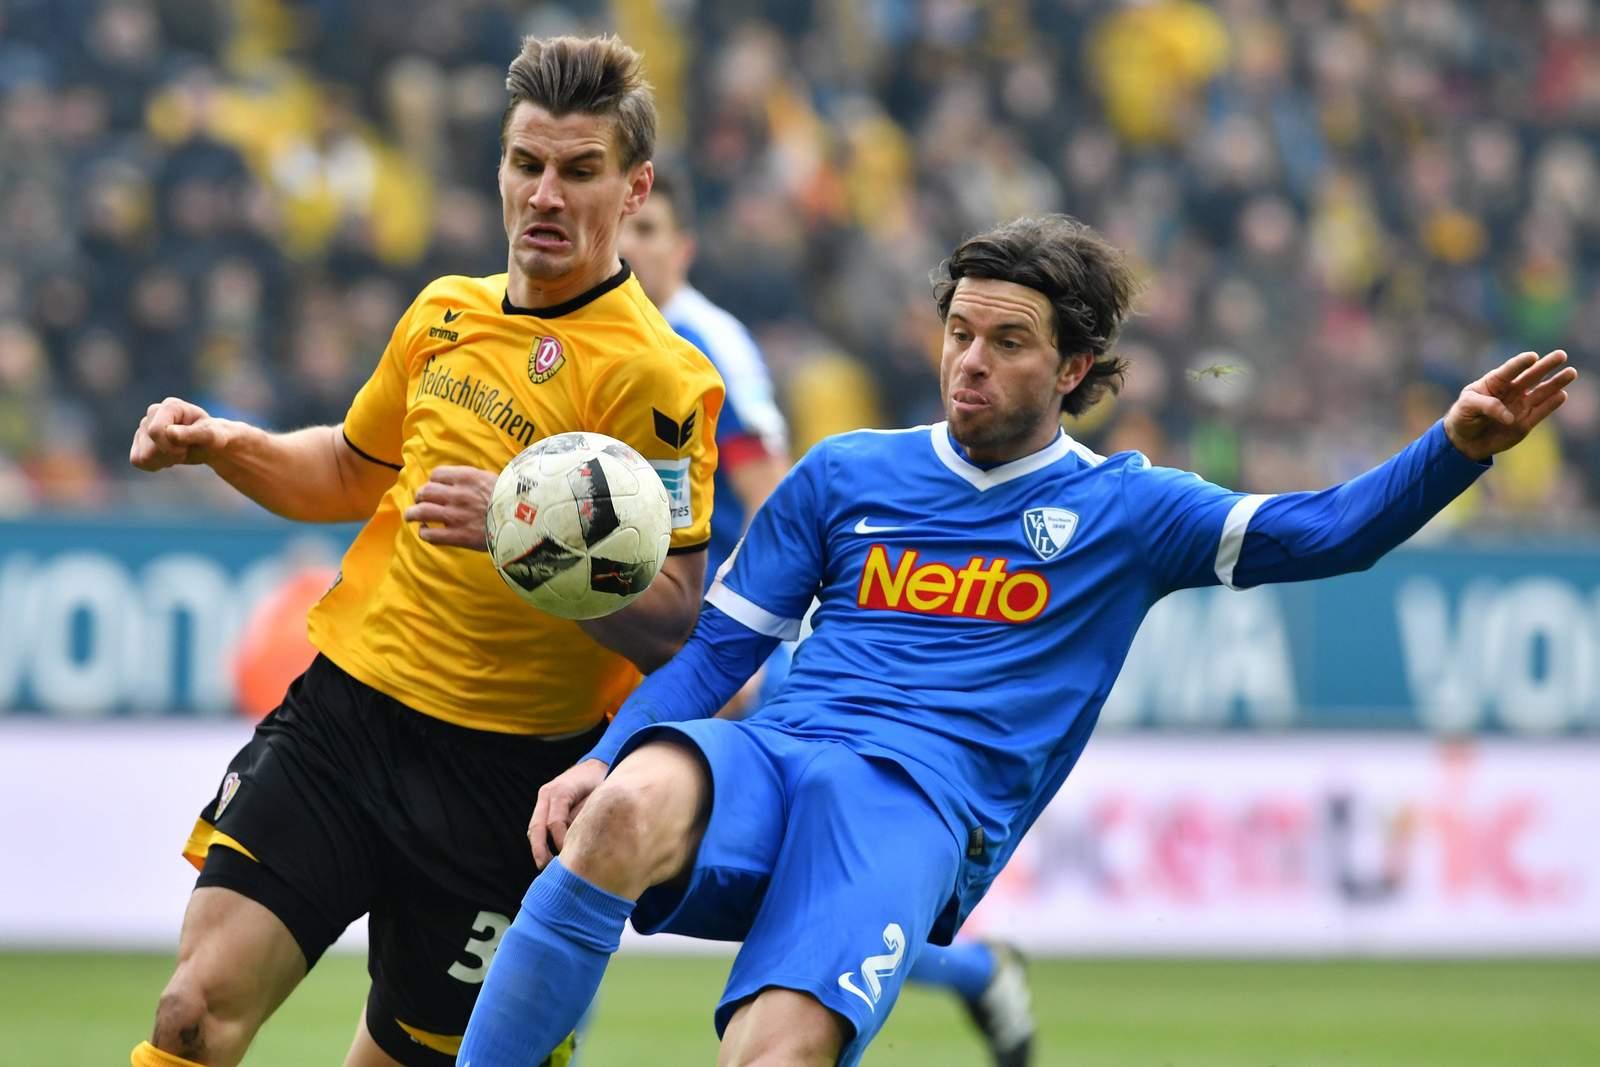 Nürnberg dreht Partie gegen Bochum